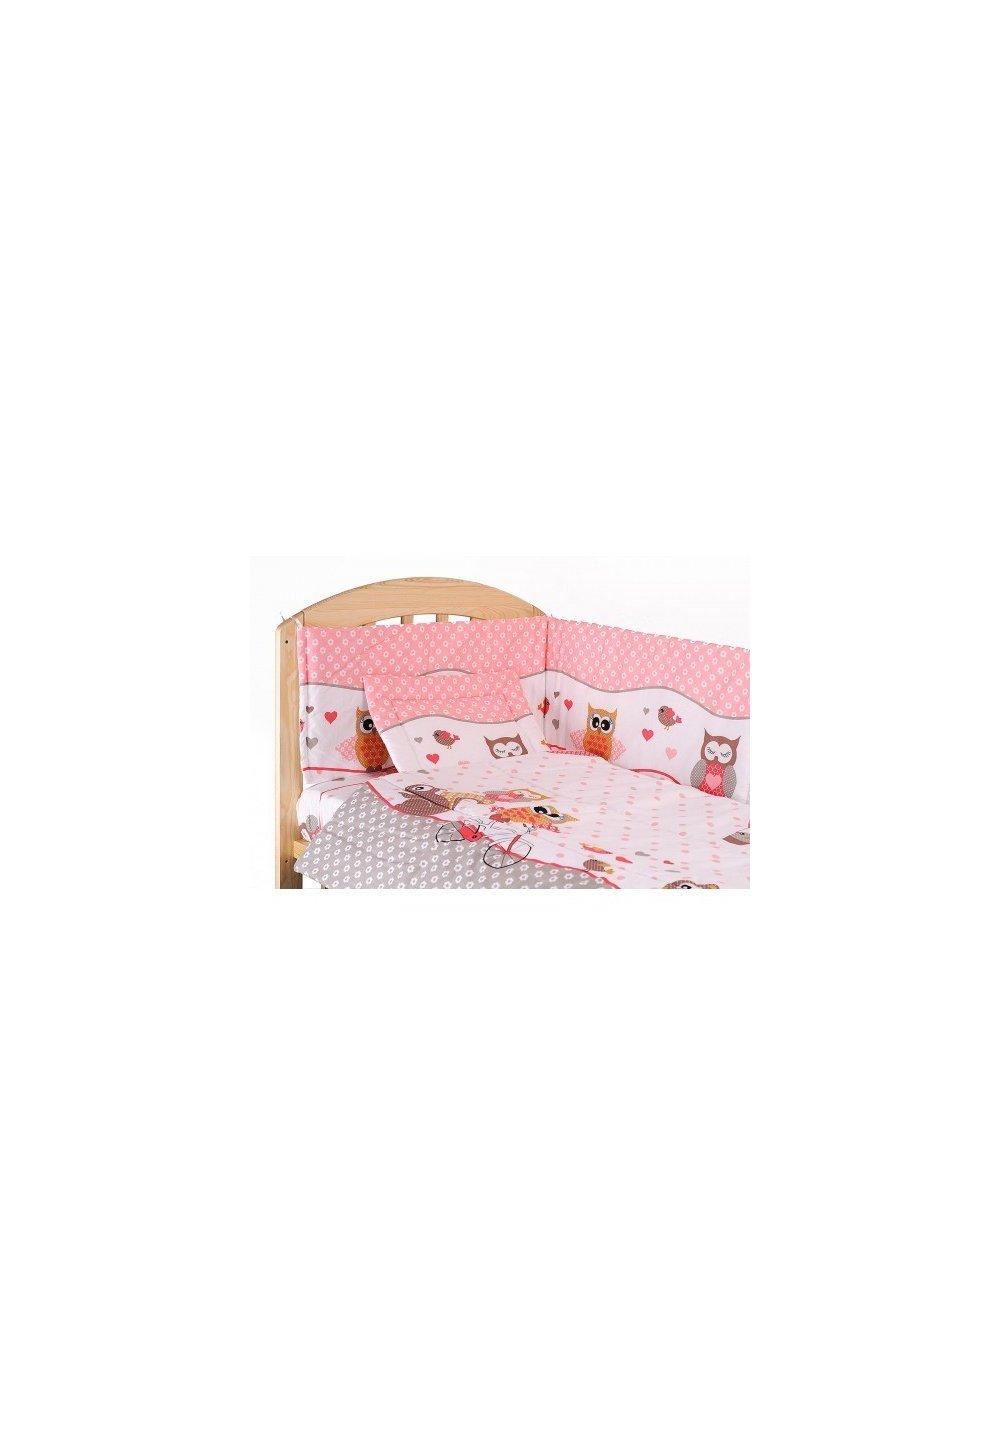 Lenjerie patut, 5 piese, Bufinite roz, 140x70 cm imagine